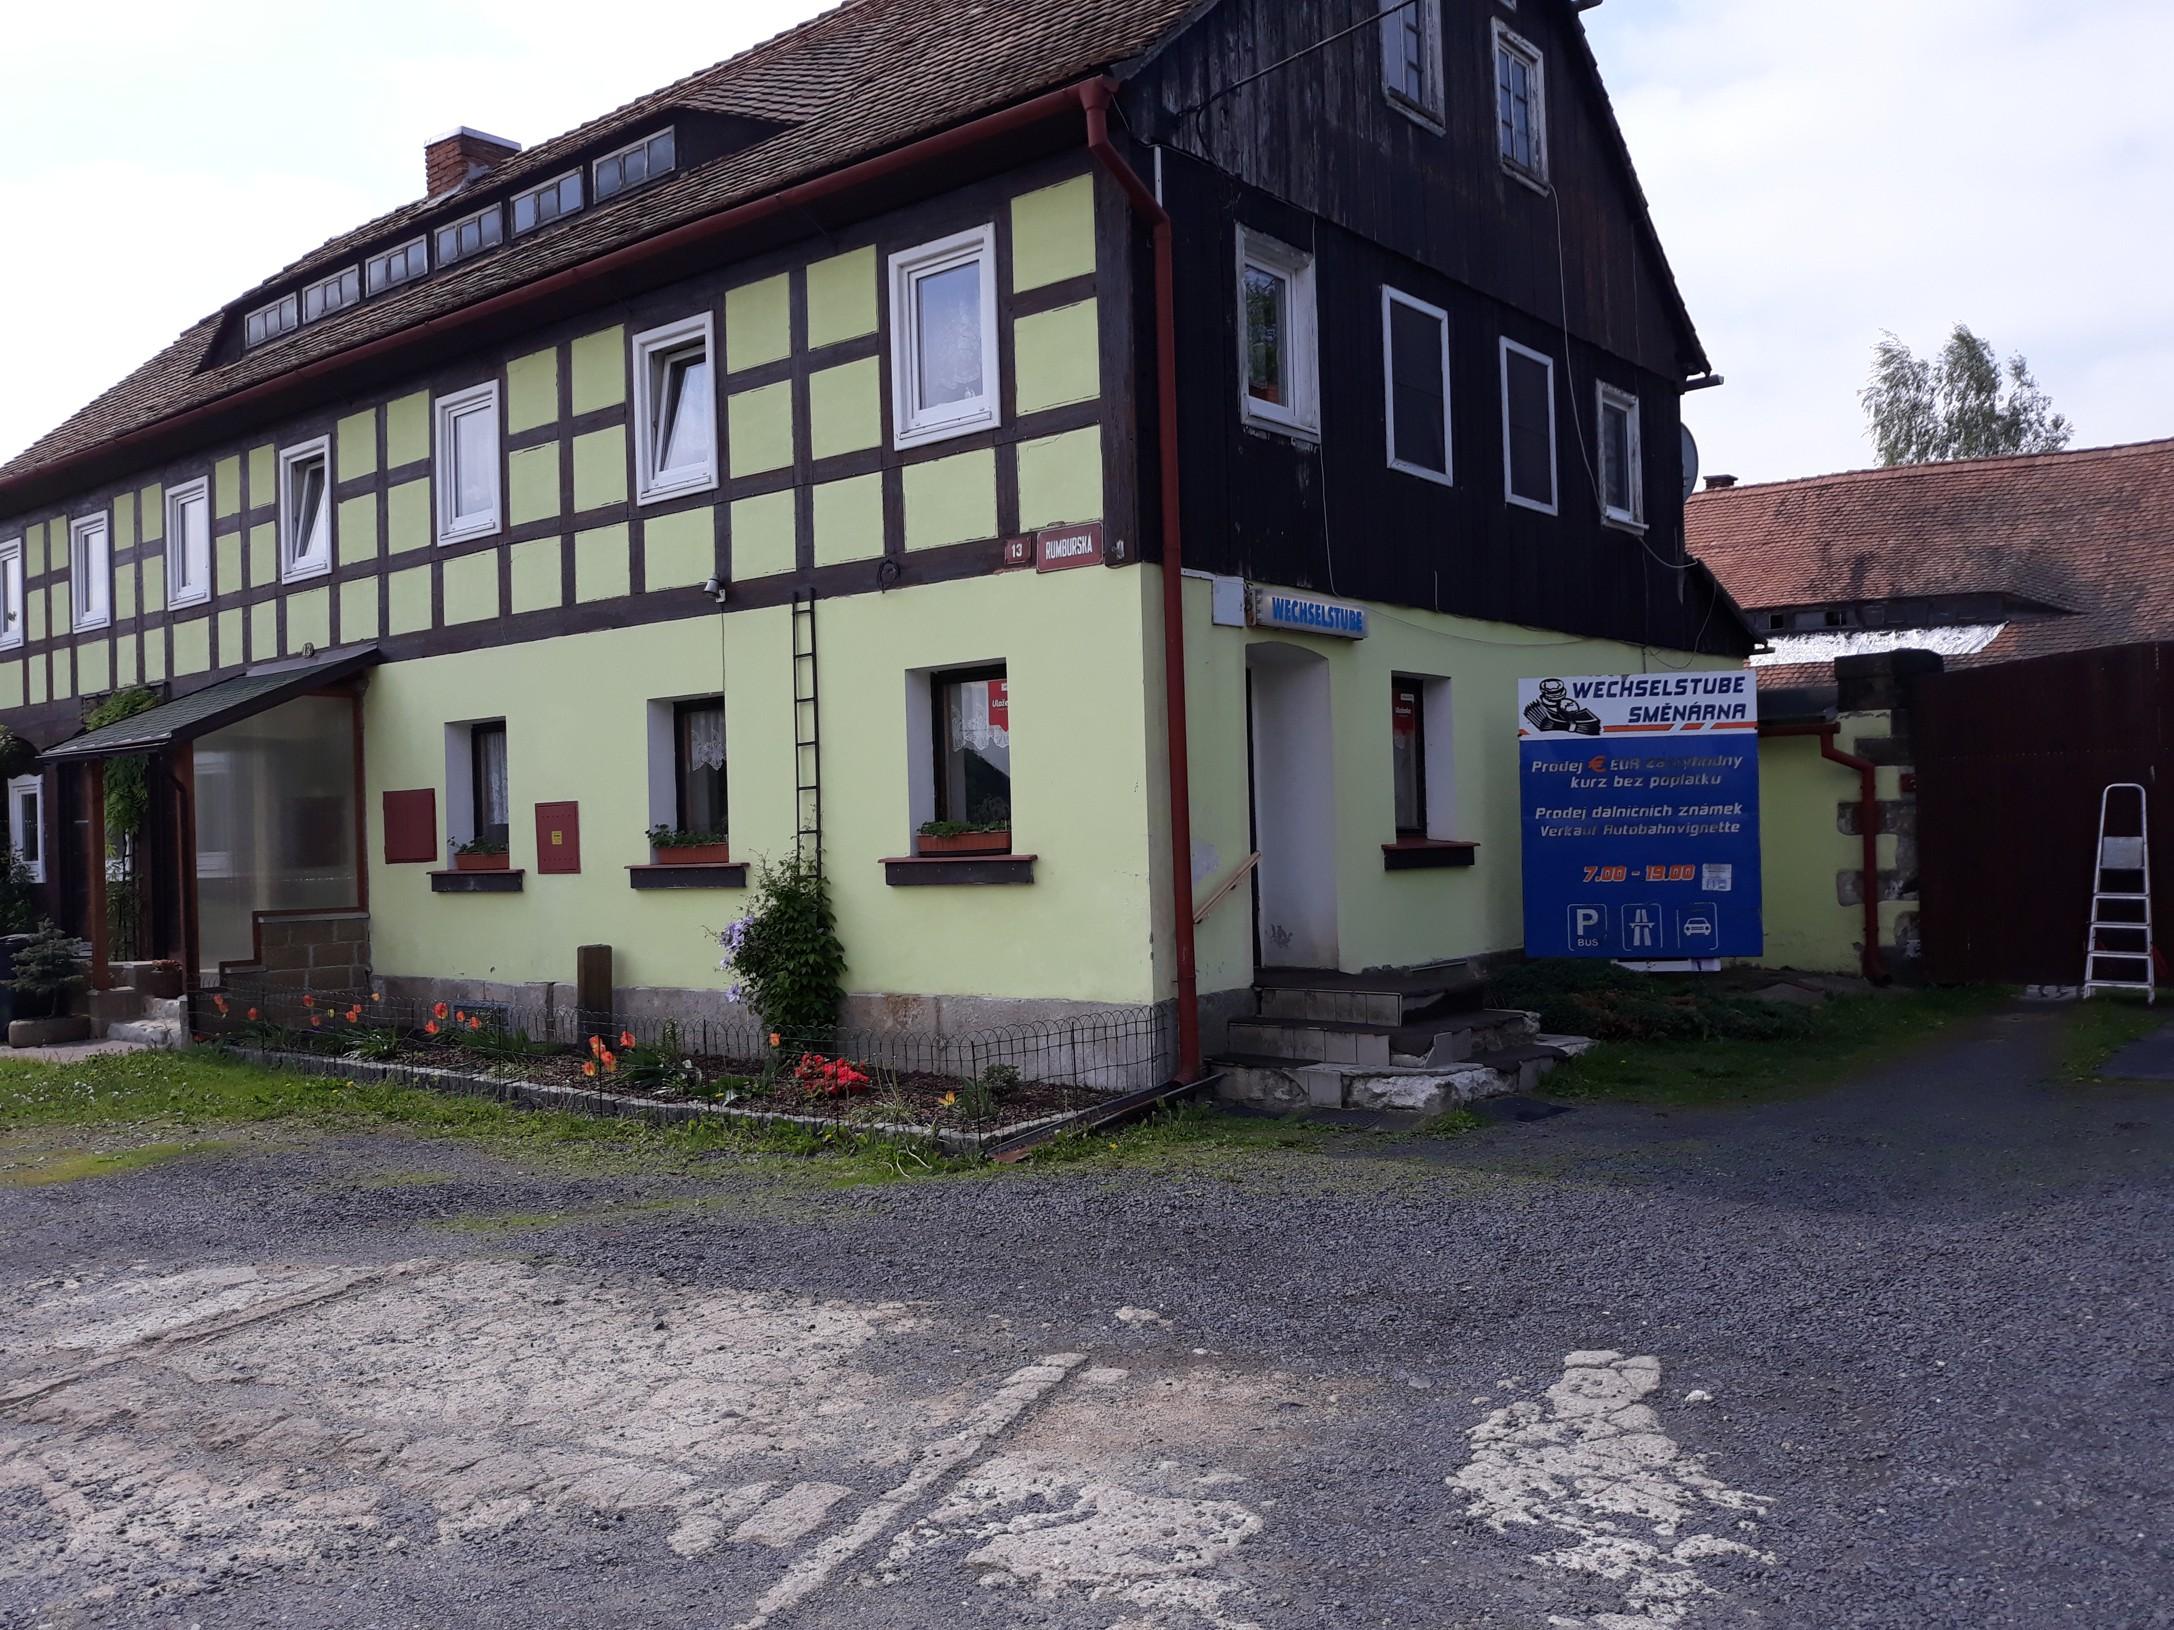 Pobočka Varnsdorf, Rumburská 13 (Směnárna)